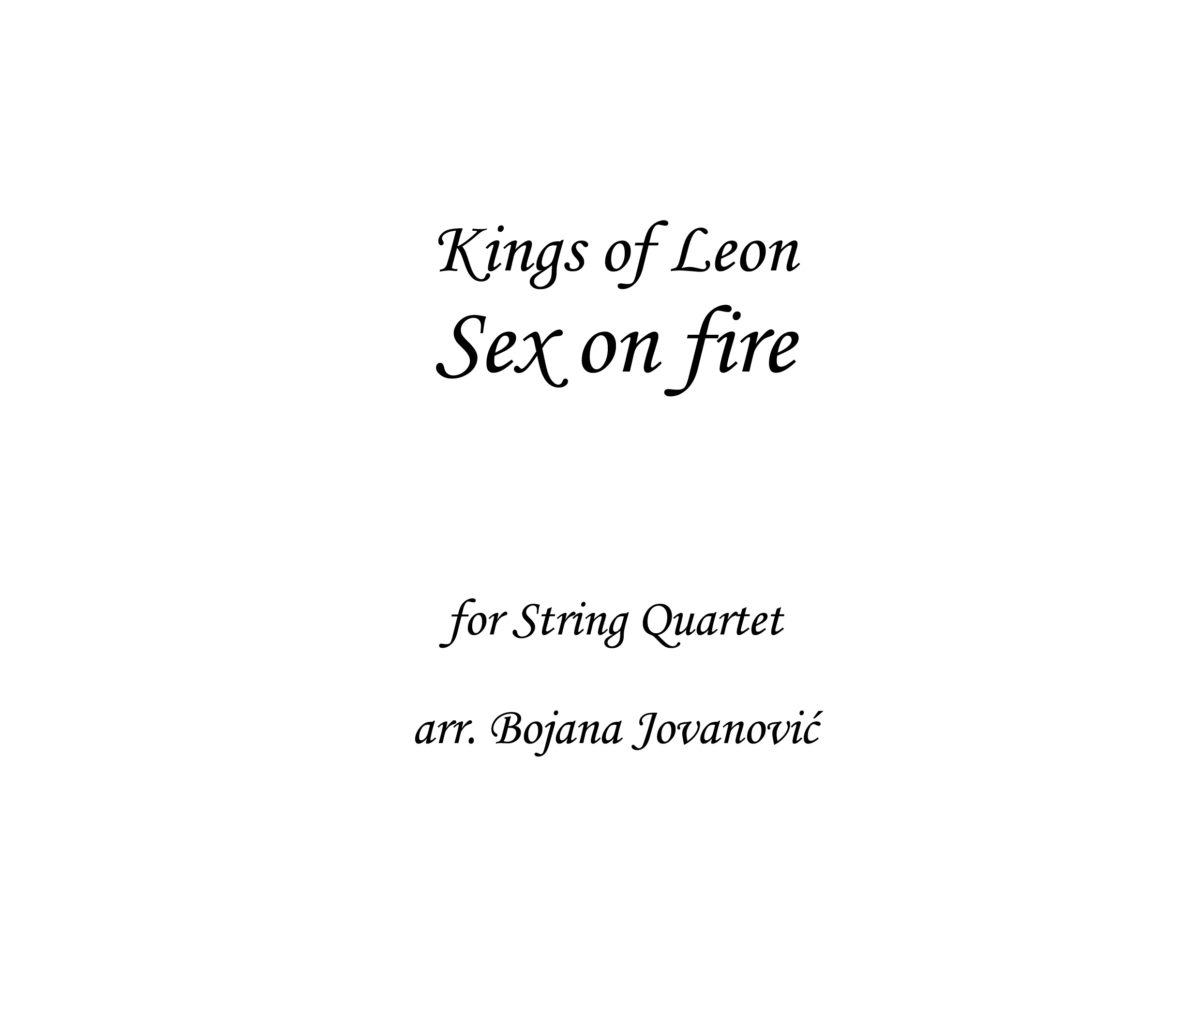 Sex on fire Kings of Leon Sheet music